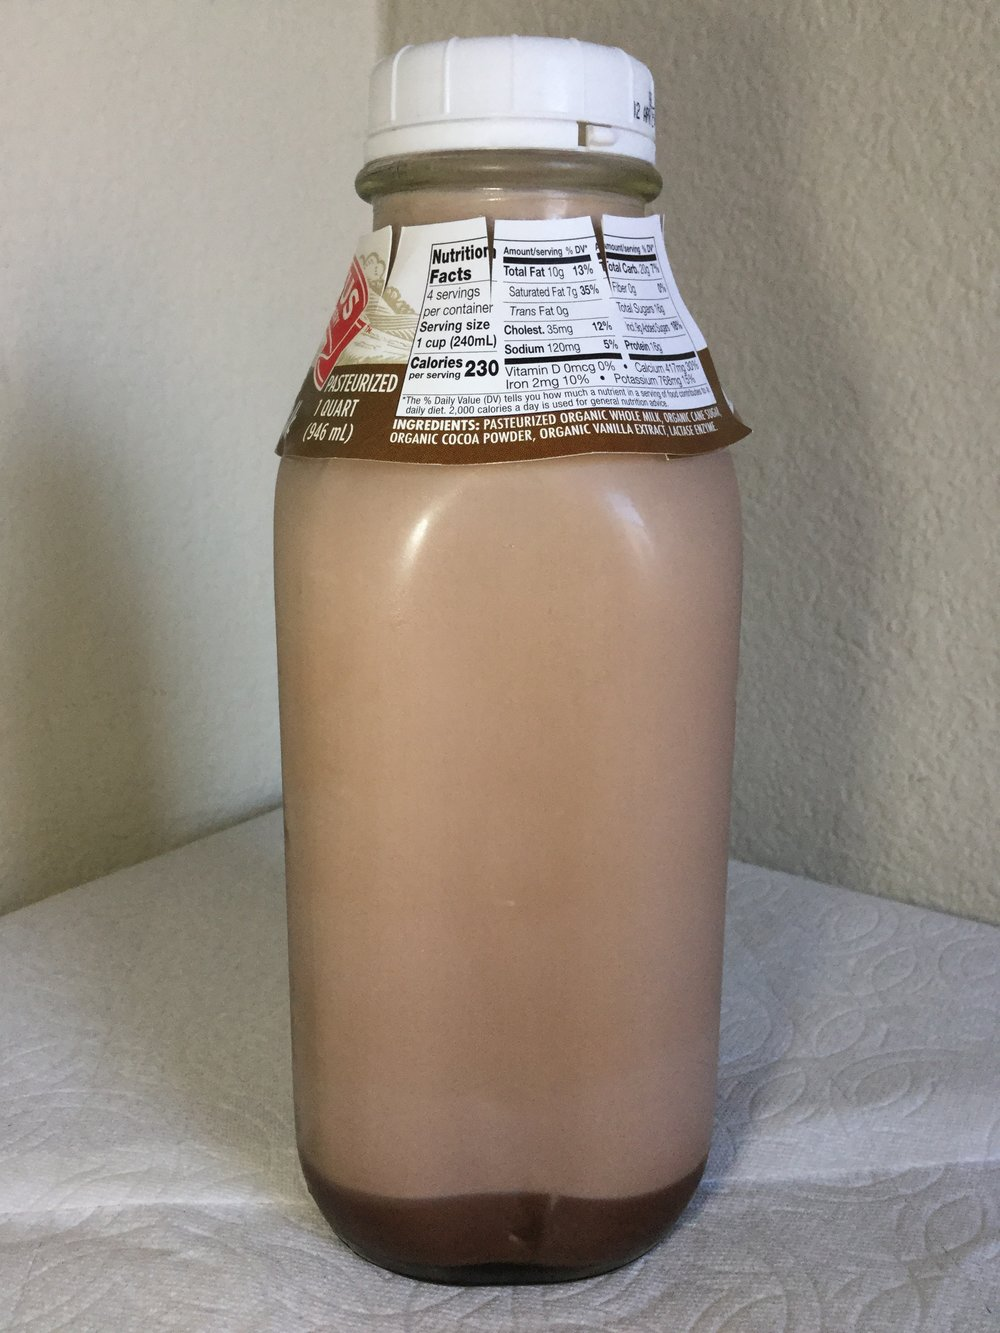 Straus Family Creamery Organic Chocolate Milk Side 1